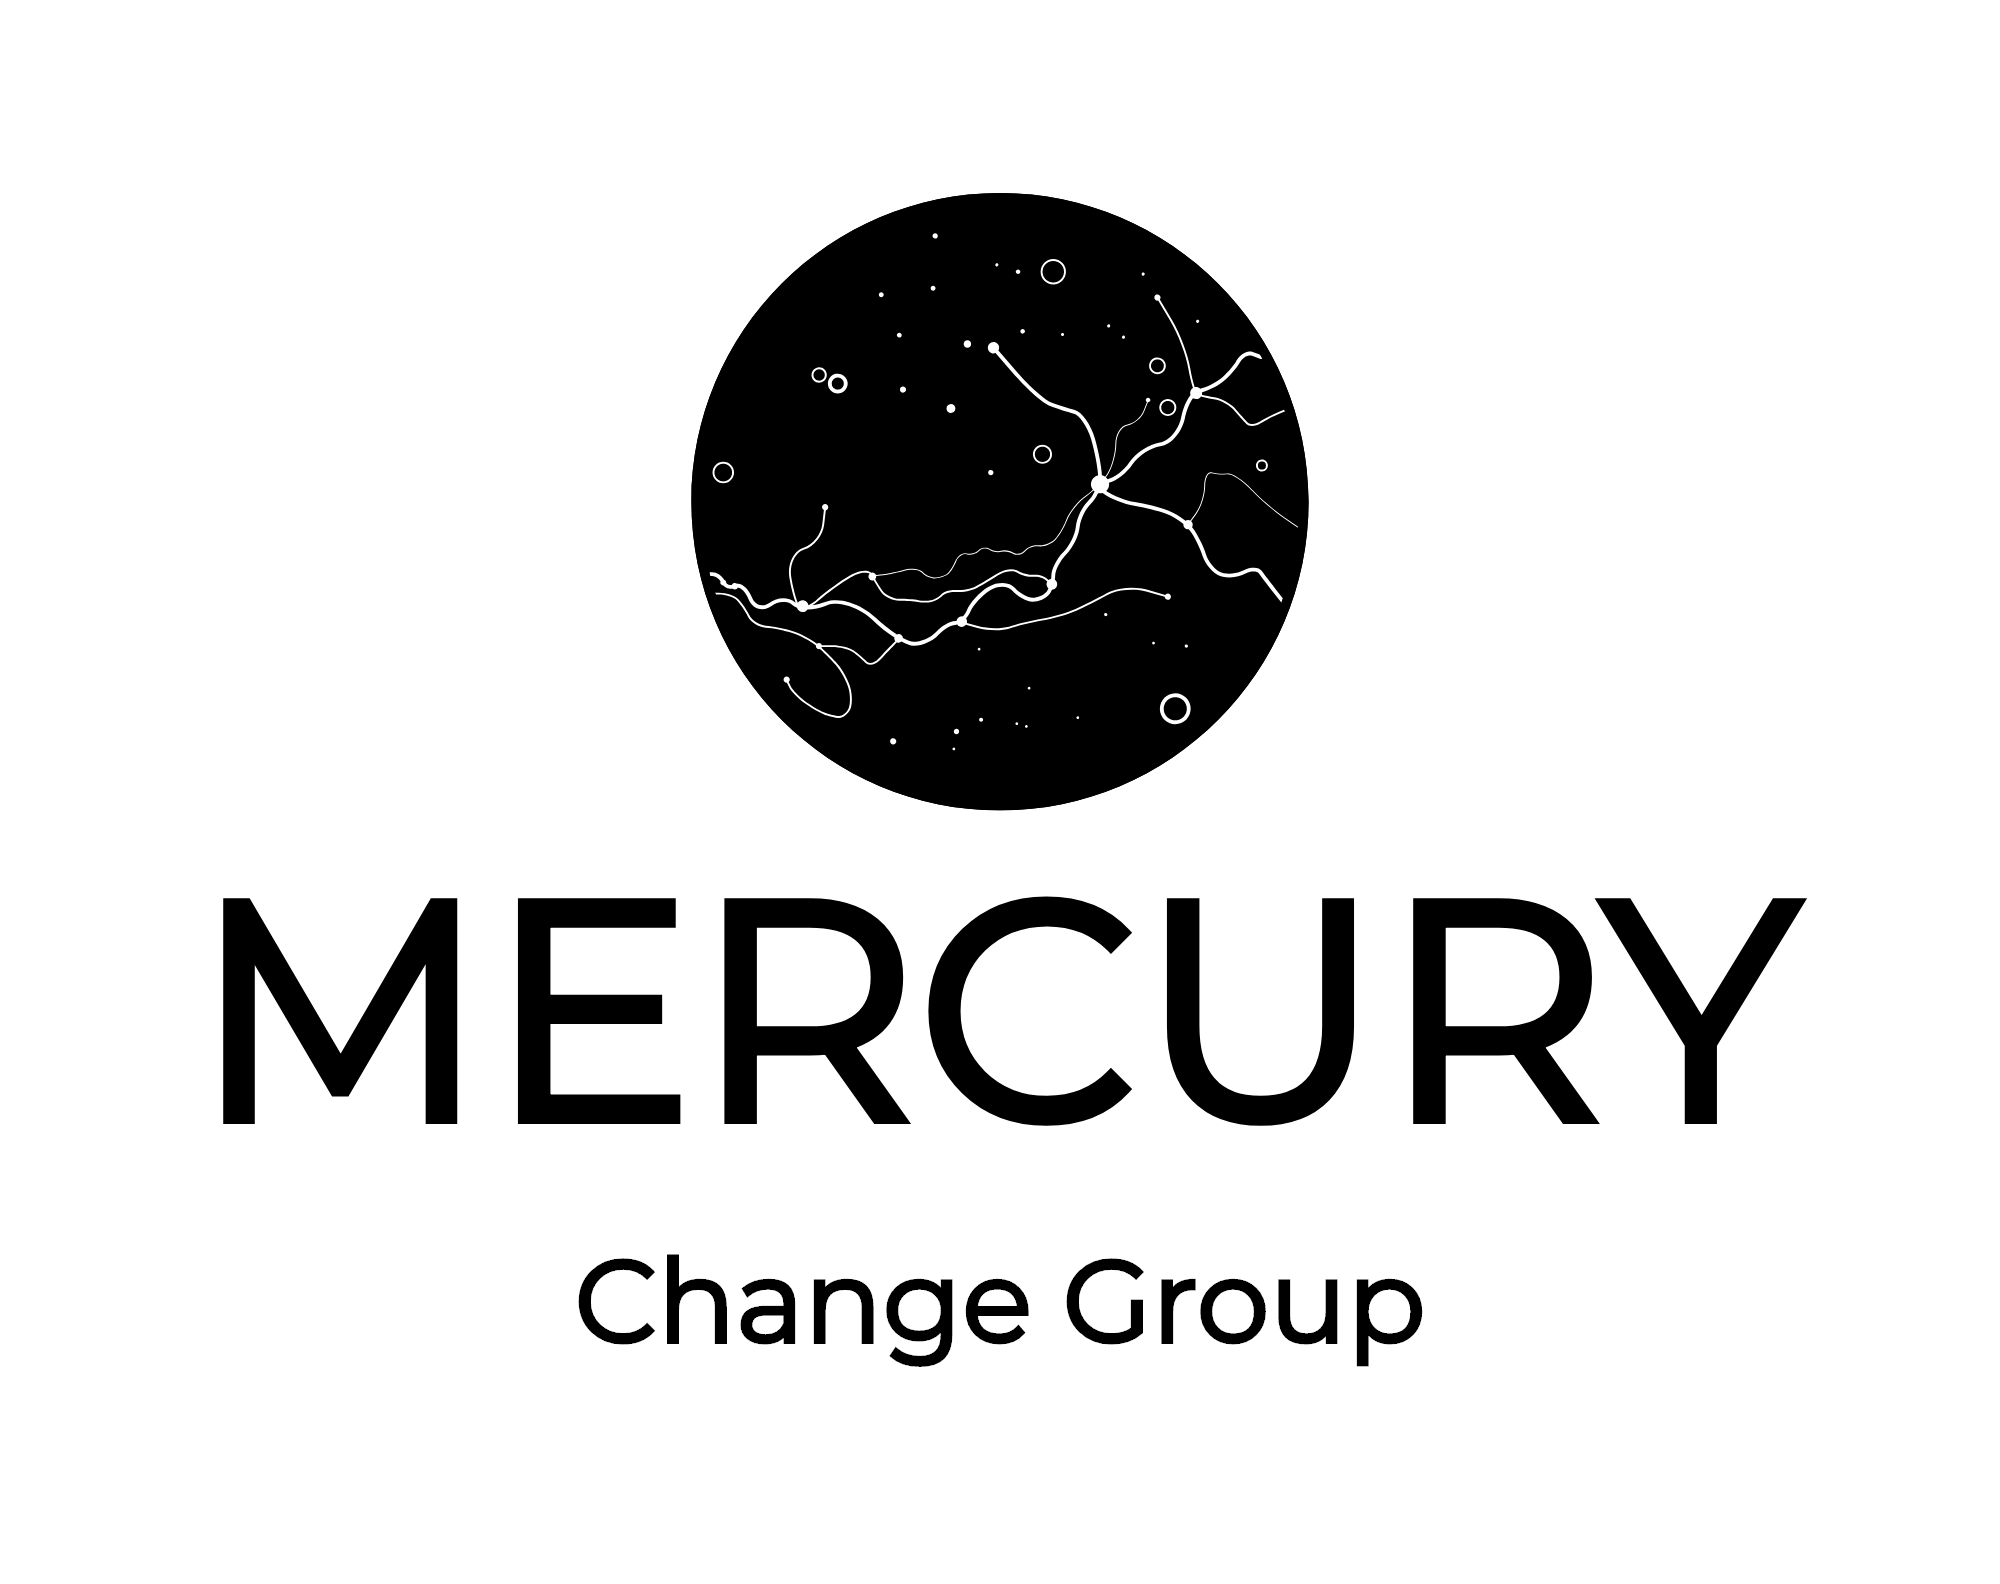 MERCURY-logo-black.png